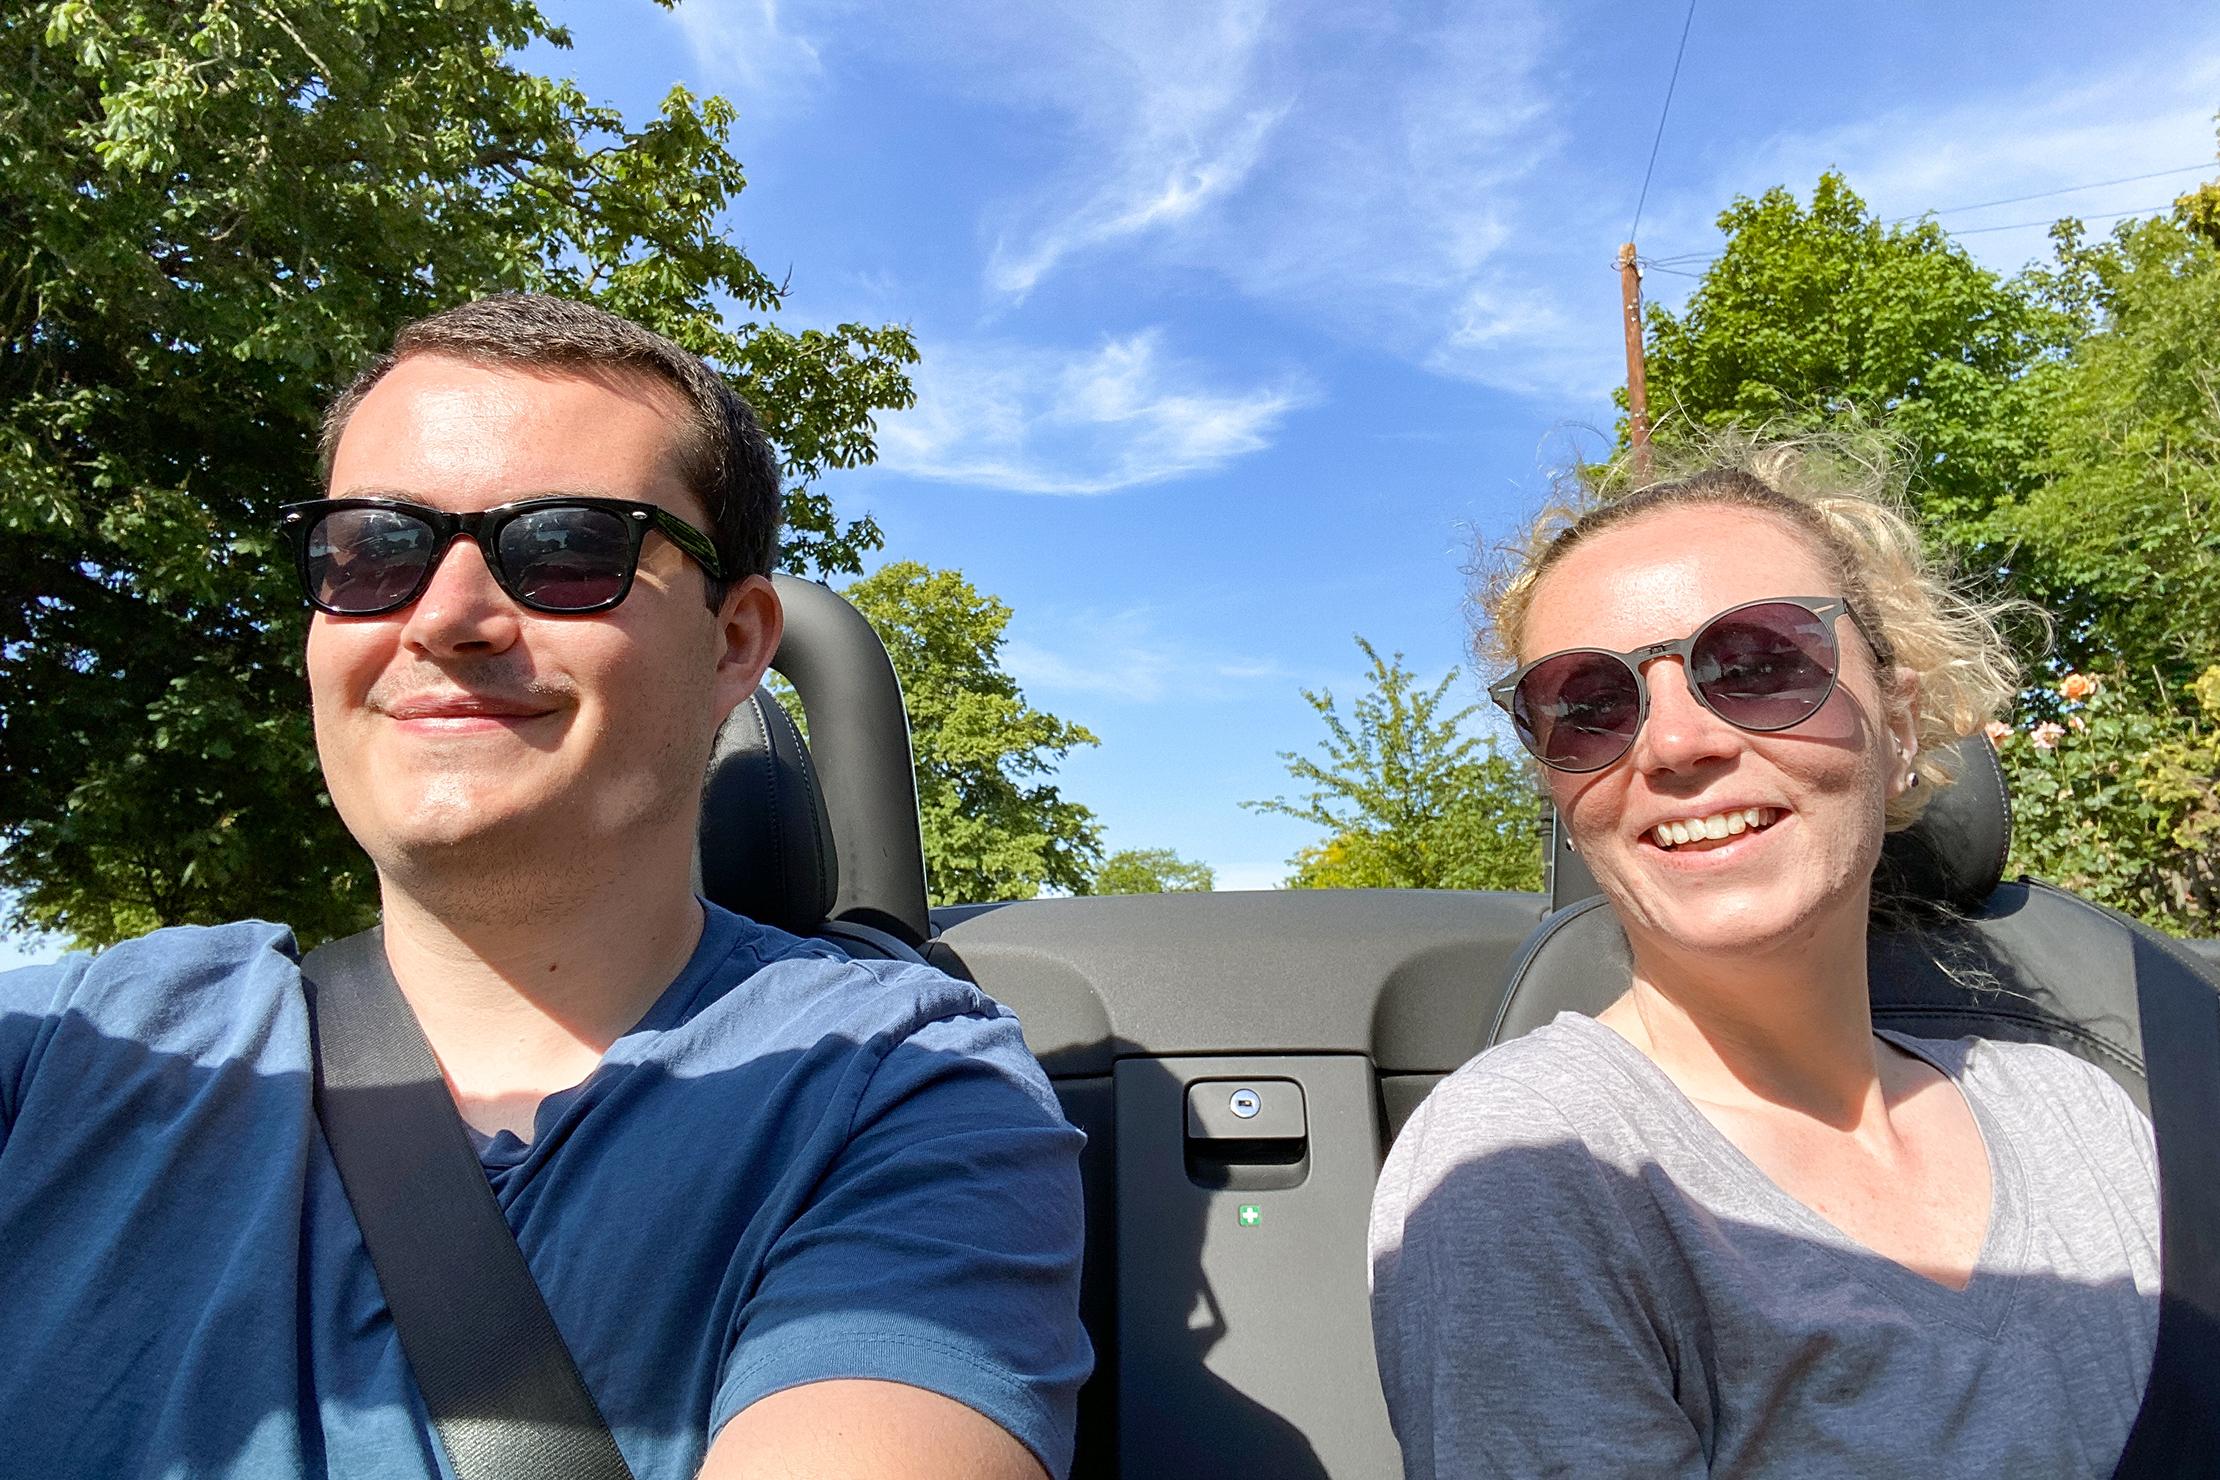 Having Fun While Driving Road Trip Guide